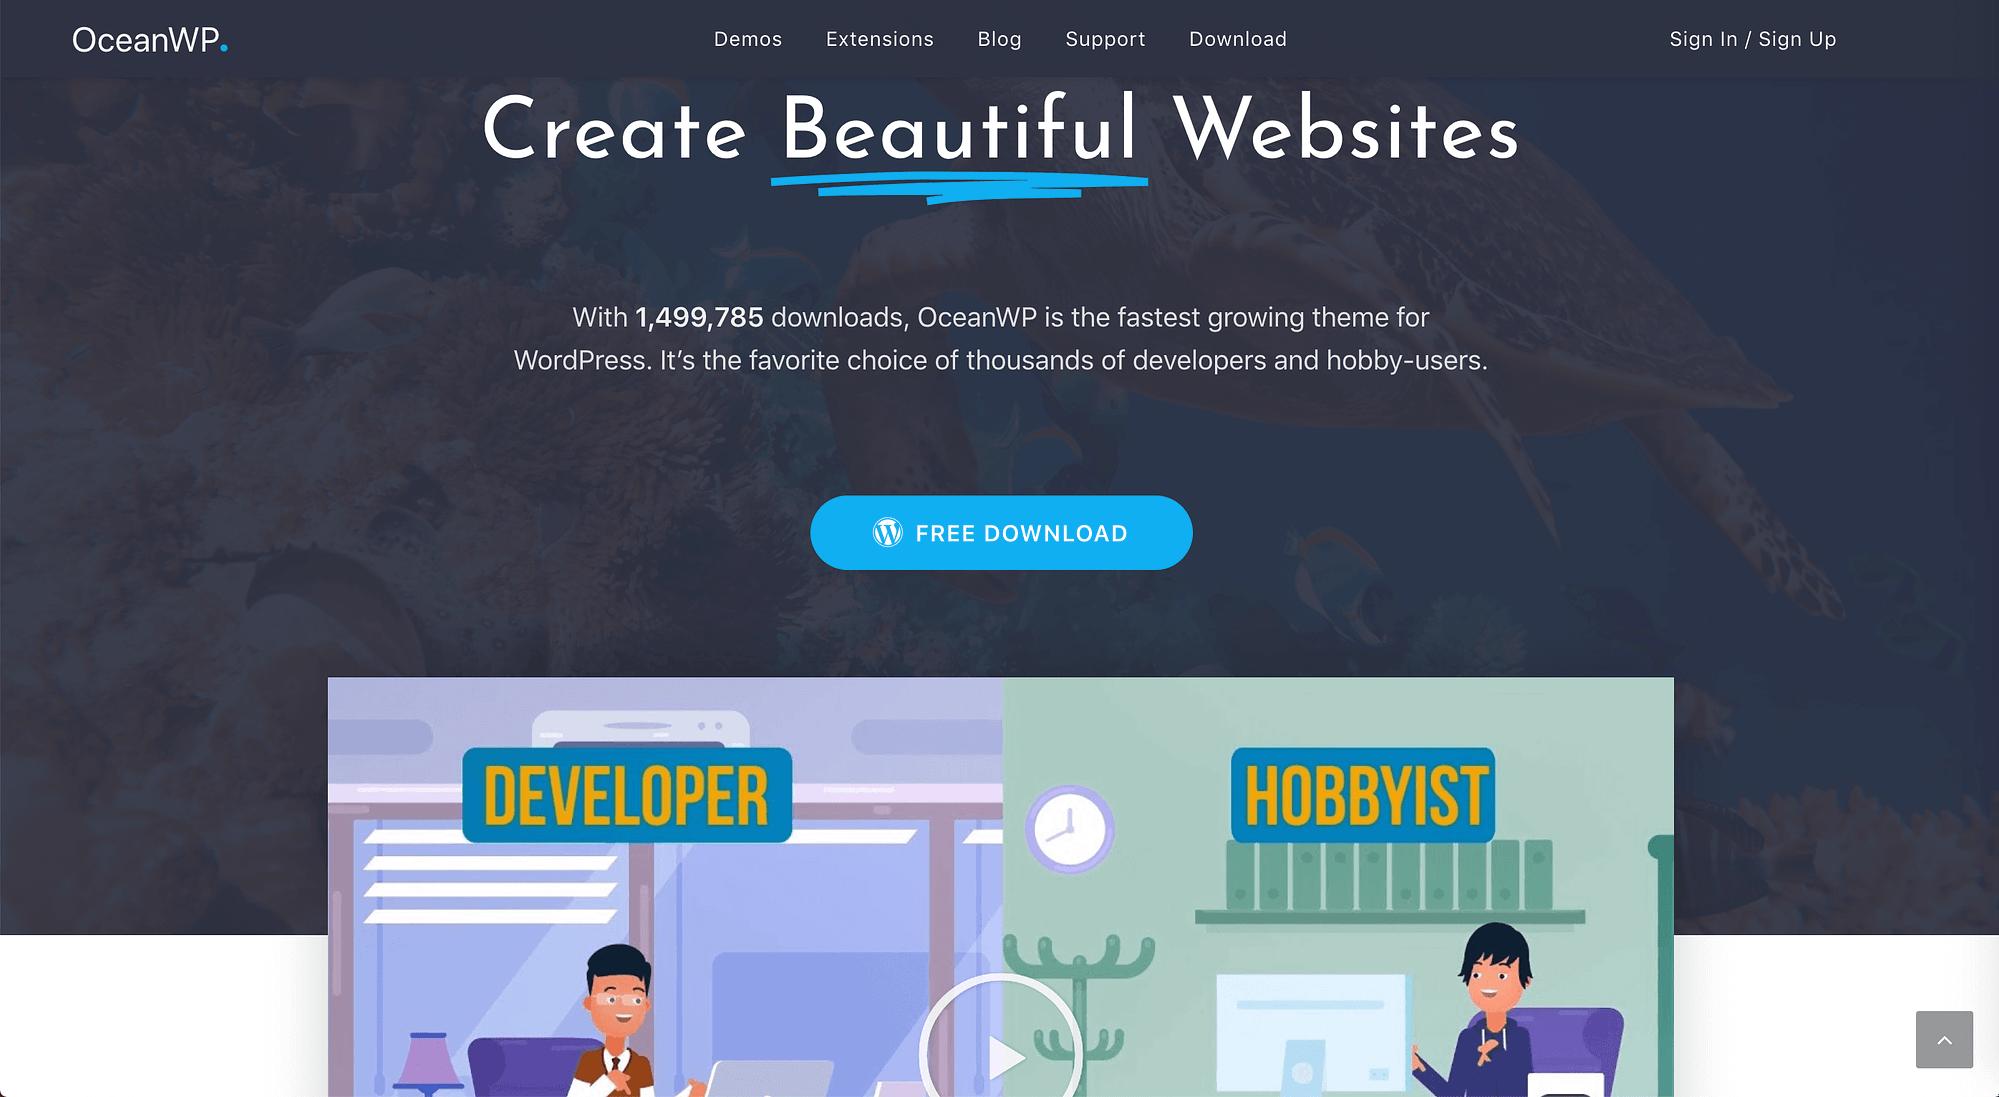 The OceanWP theme Homepage.